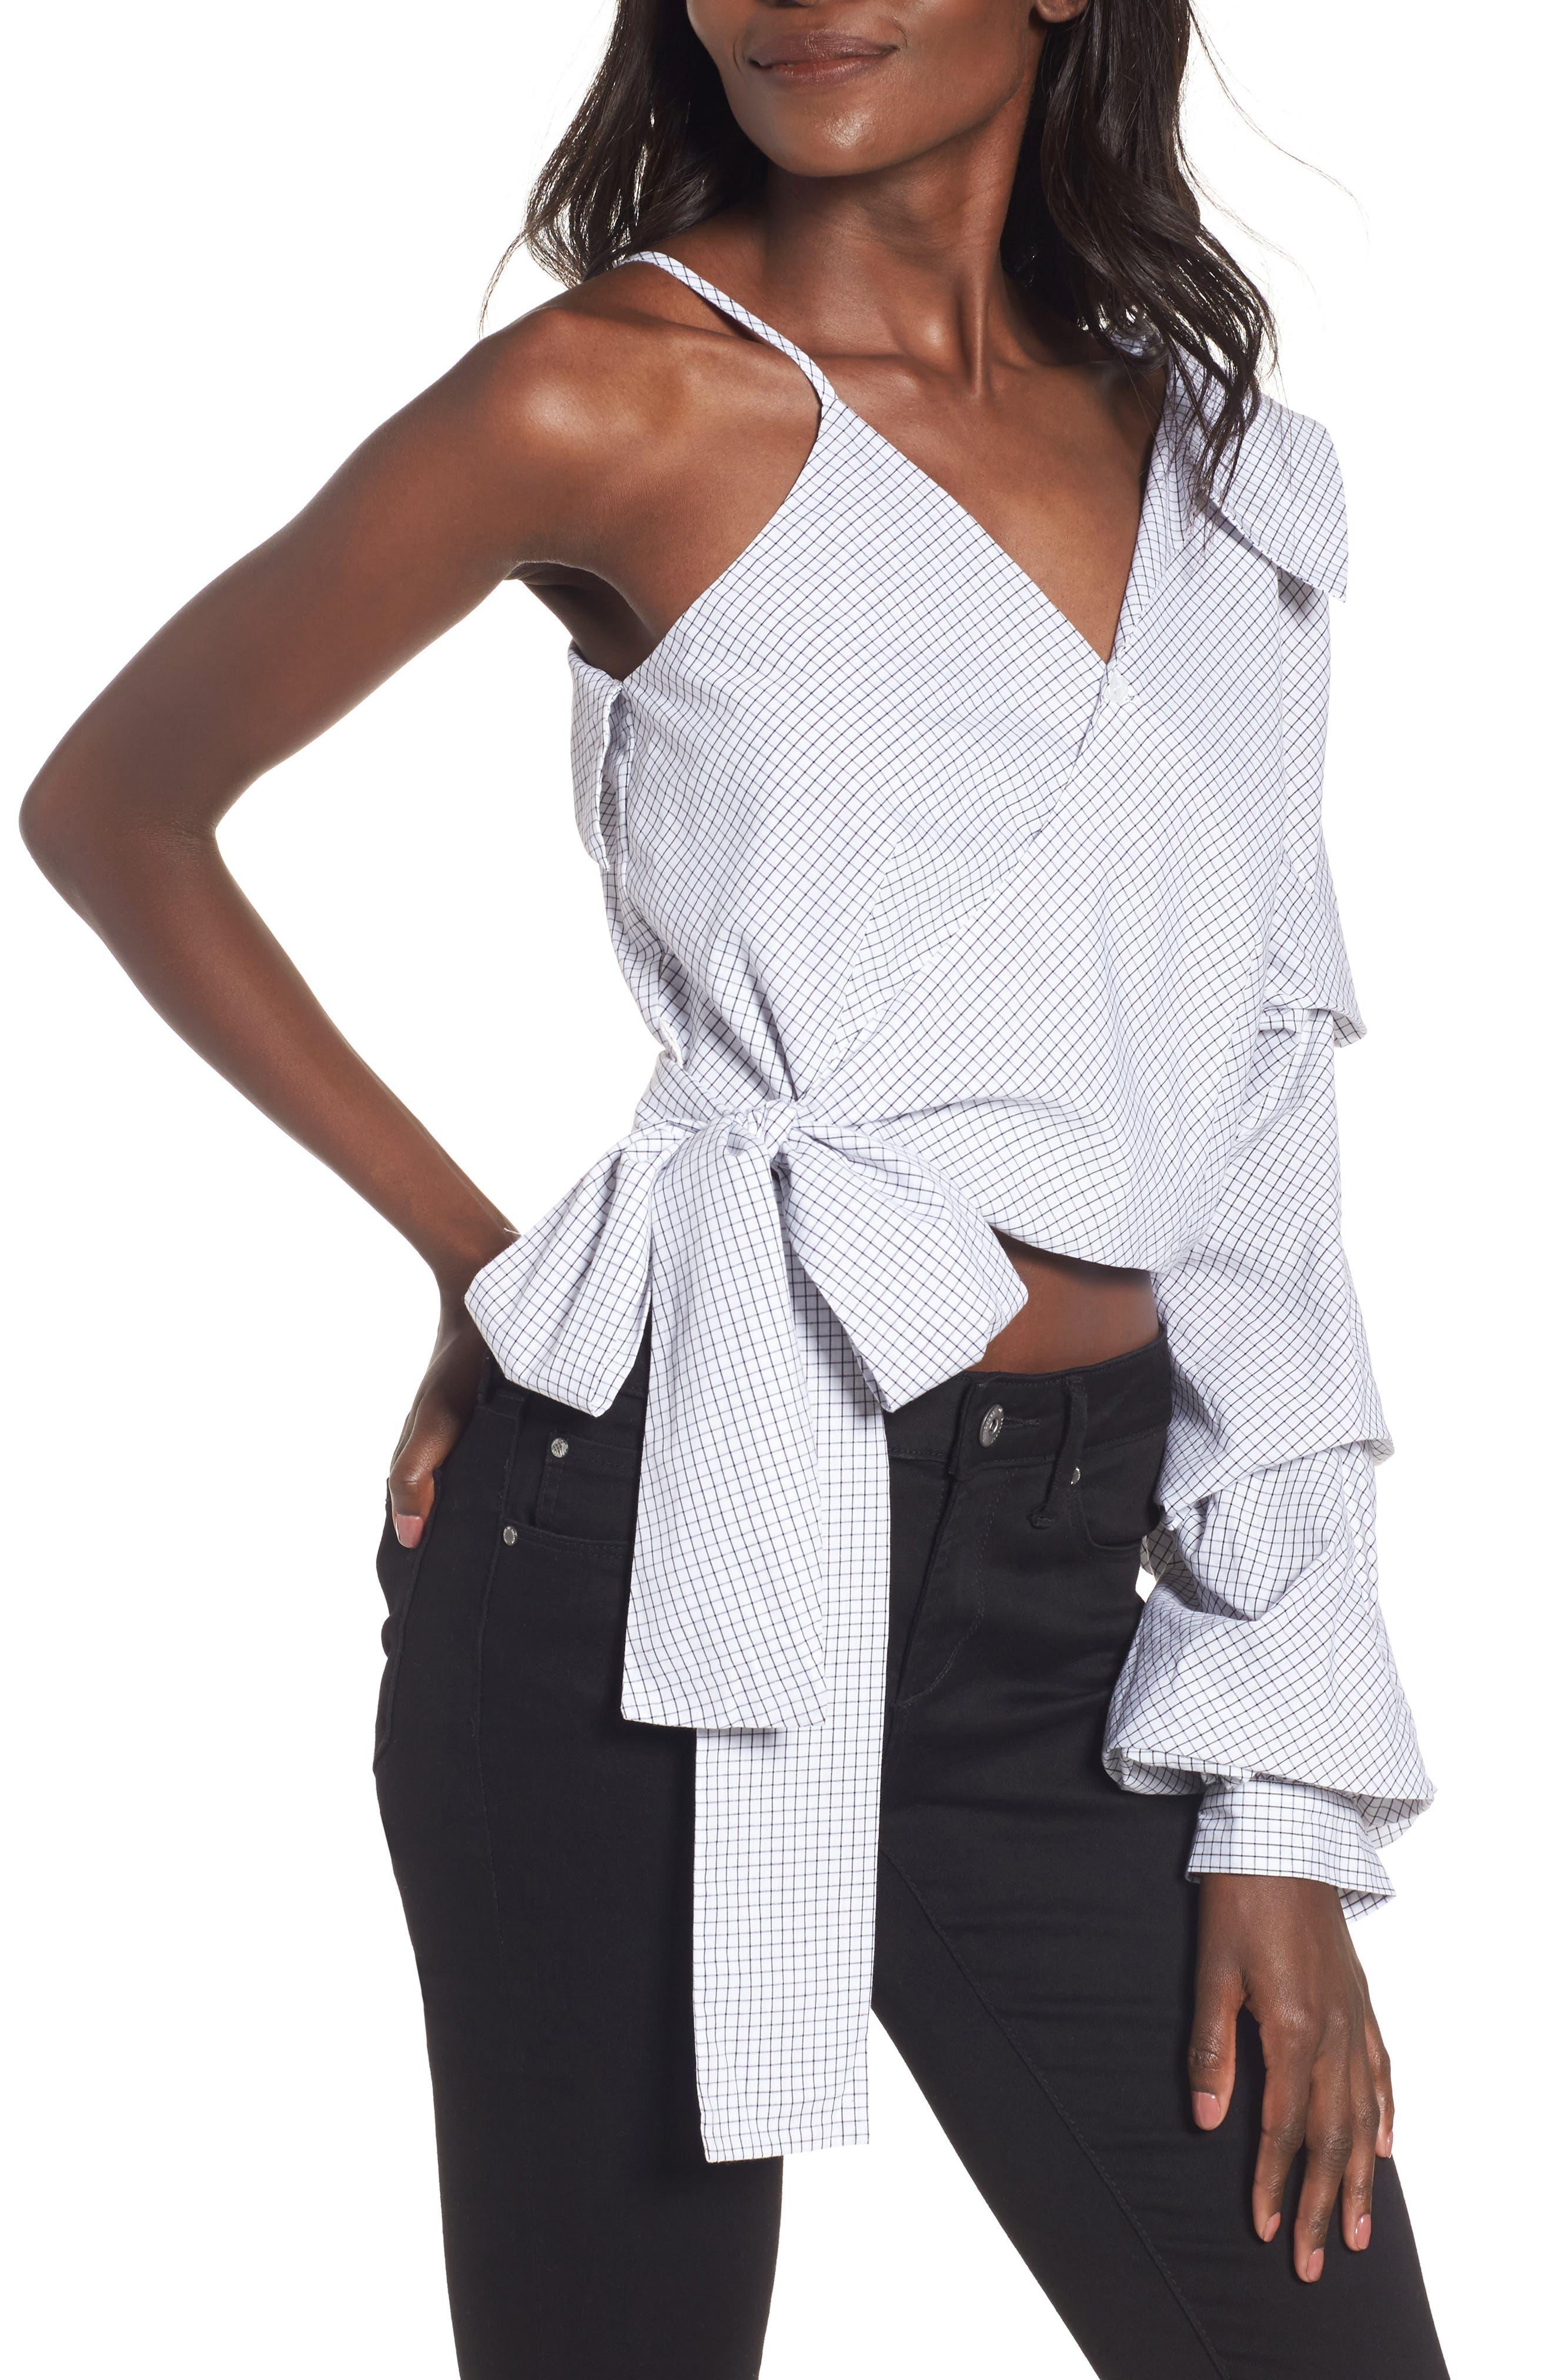 J.O.A. One-Shoulder Wrap Top